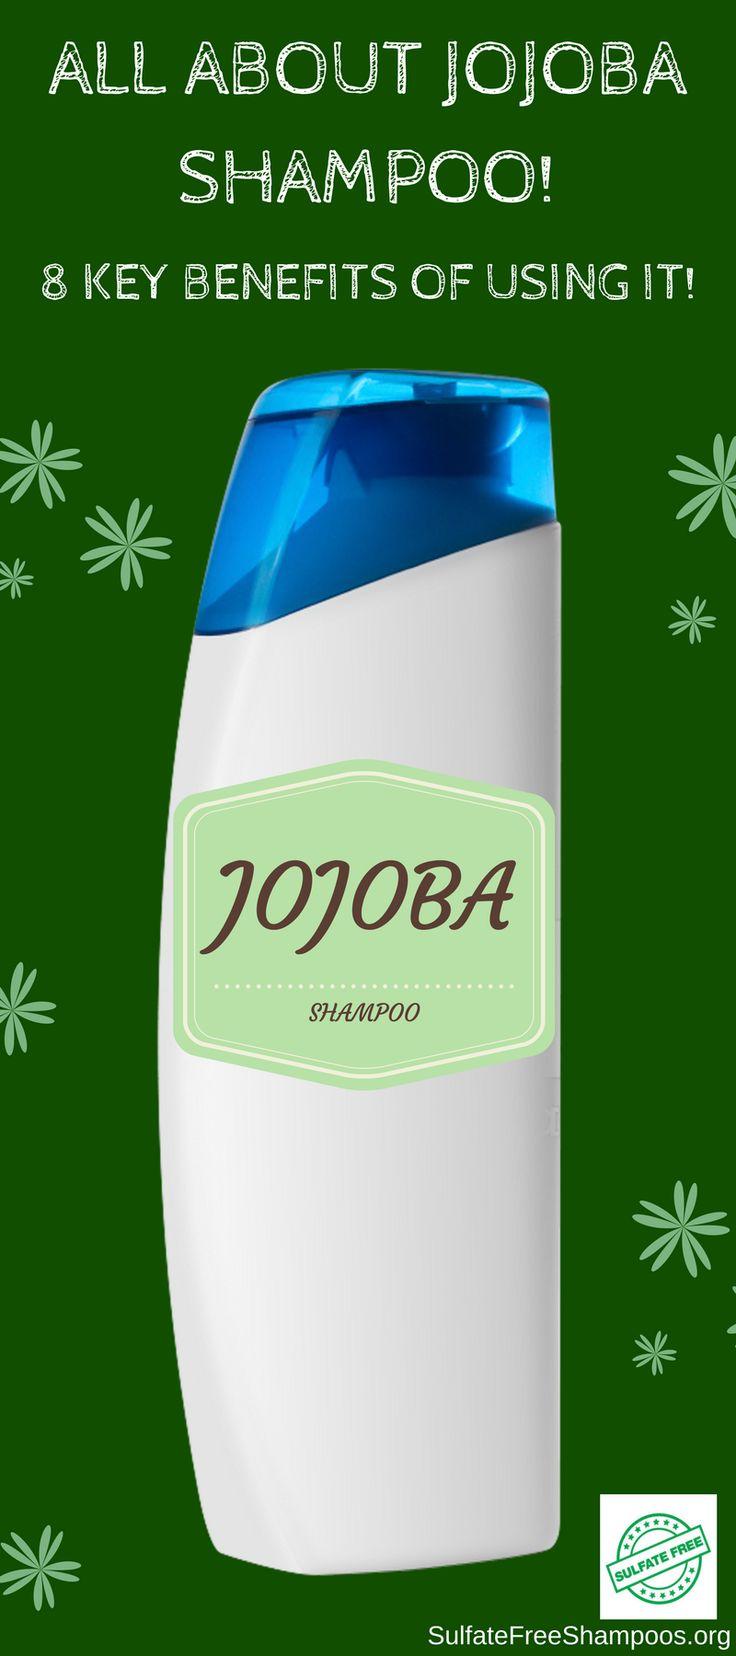 Jojoba shampoo is a great alternative. Here are 8 key benefits for using a Jojoba shampoo.